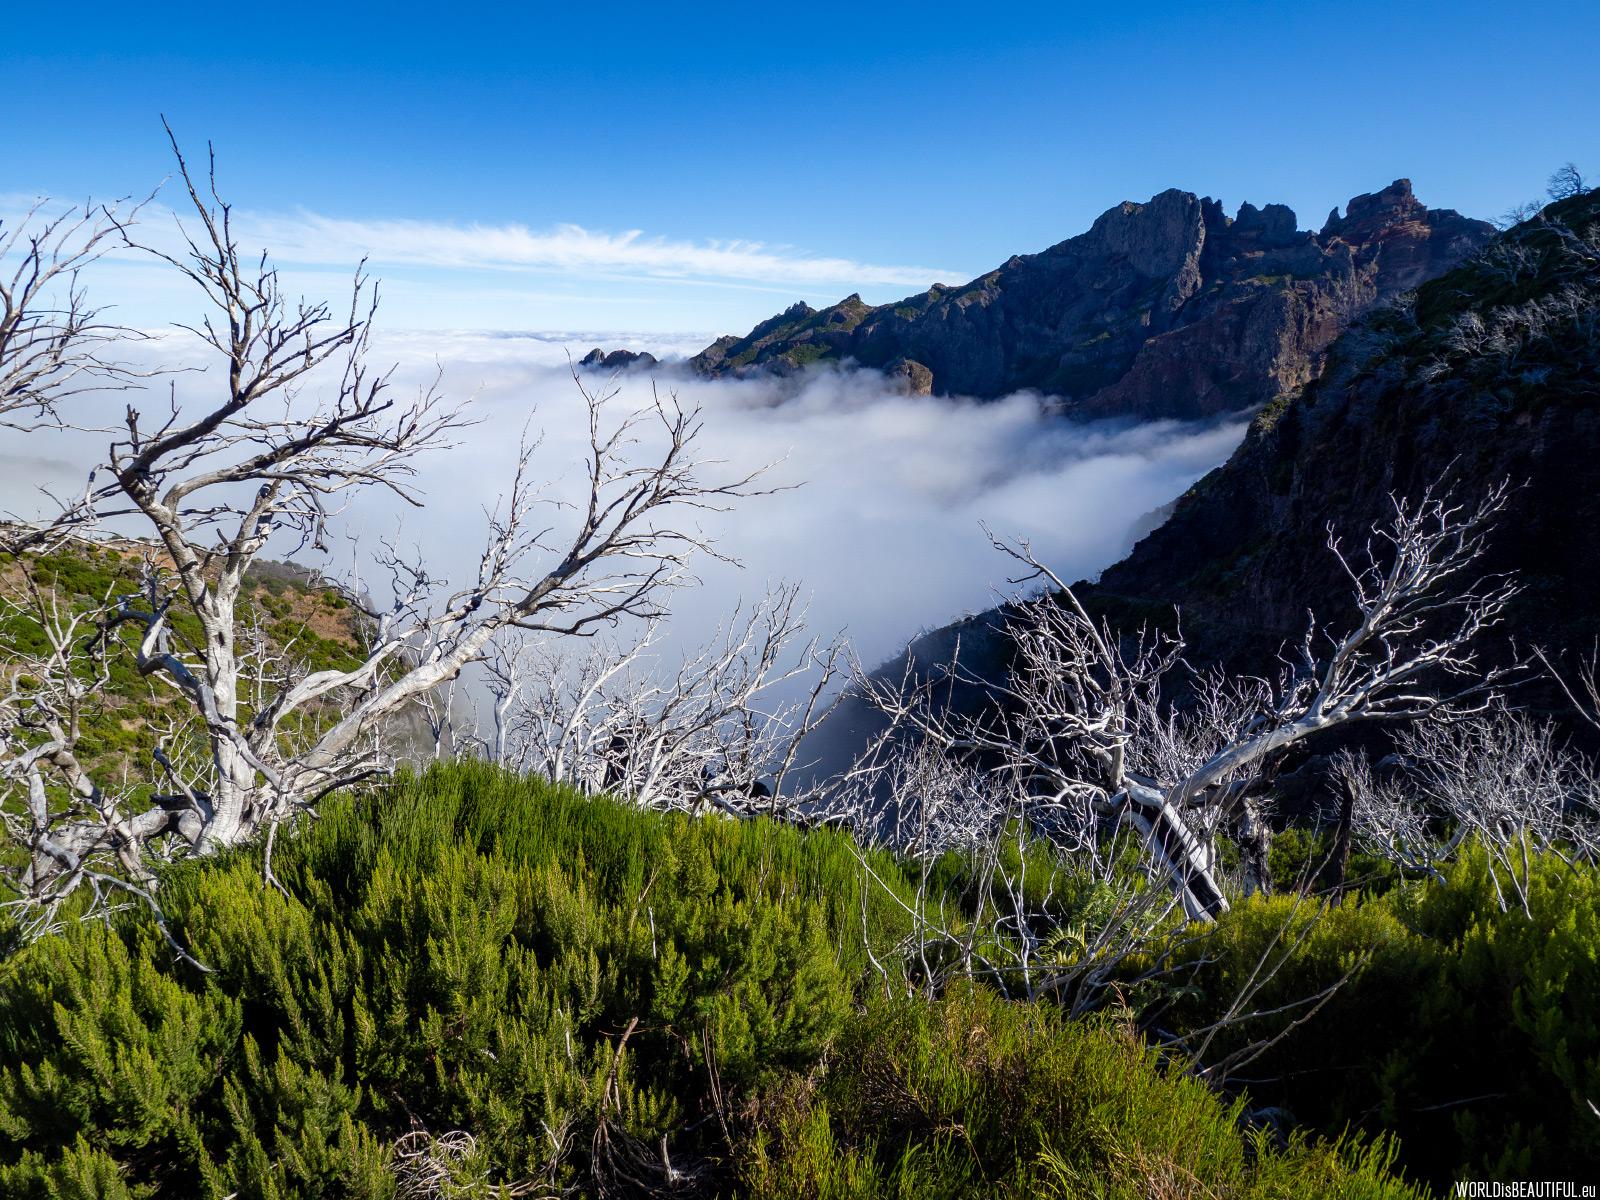 Powrót na Pico do Arieiro